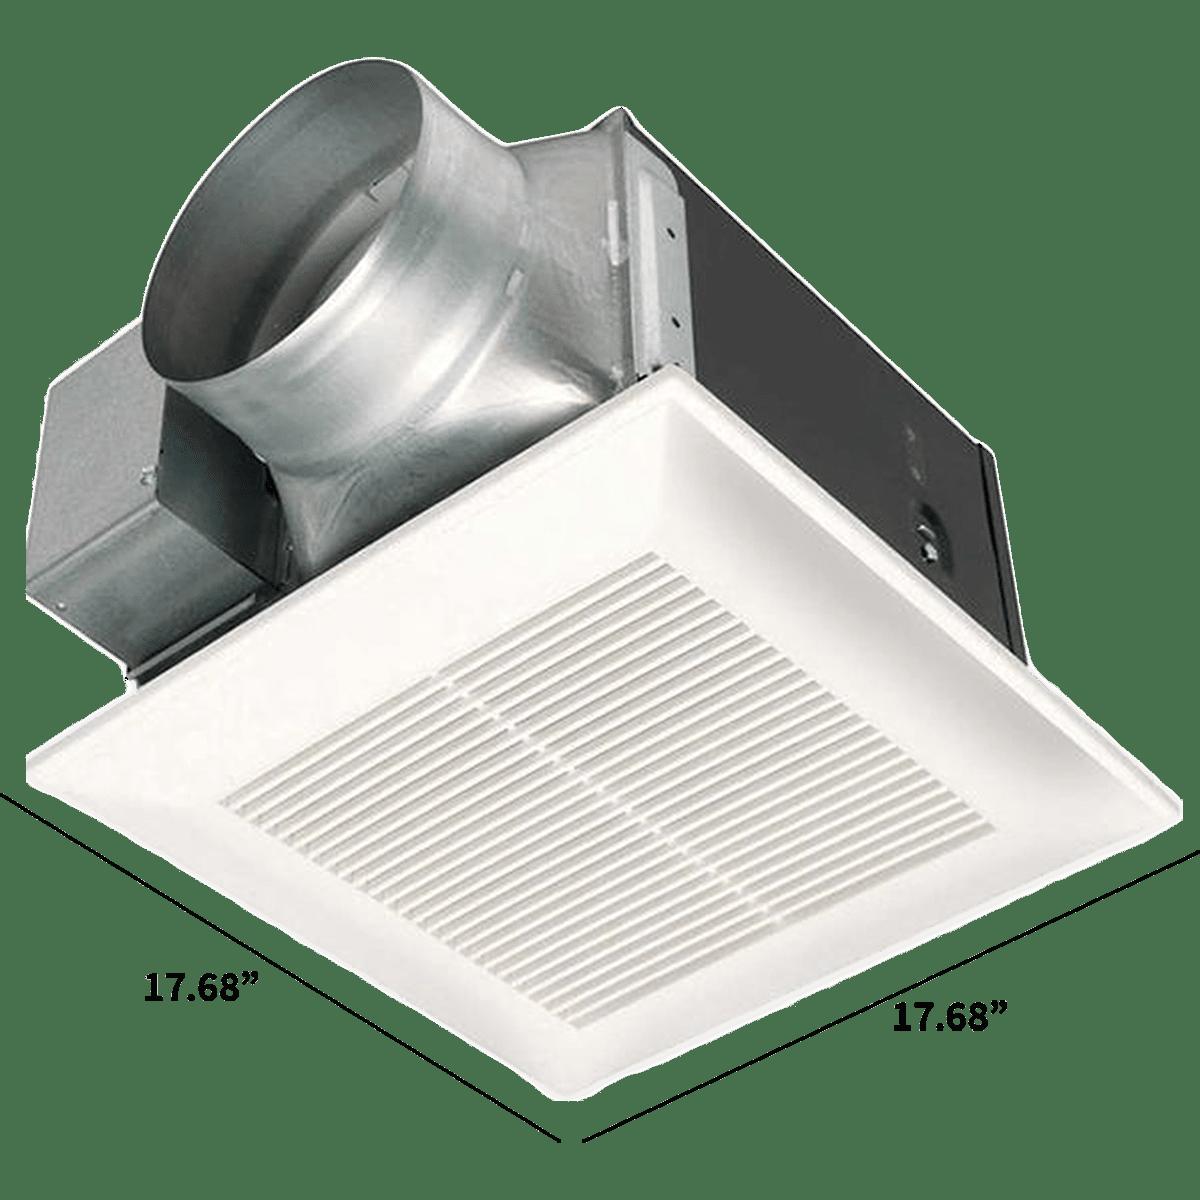 Panasonic Whisperceiling Bathroom Fans, Panasonic Bathroom Exhaust Fan With Light Parts